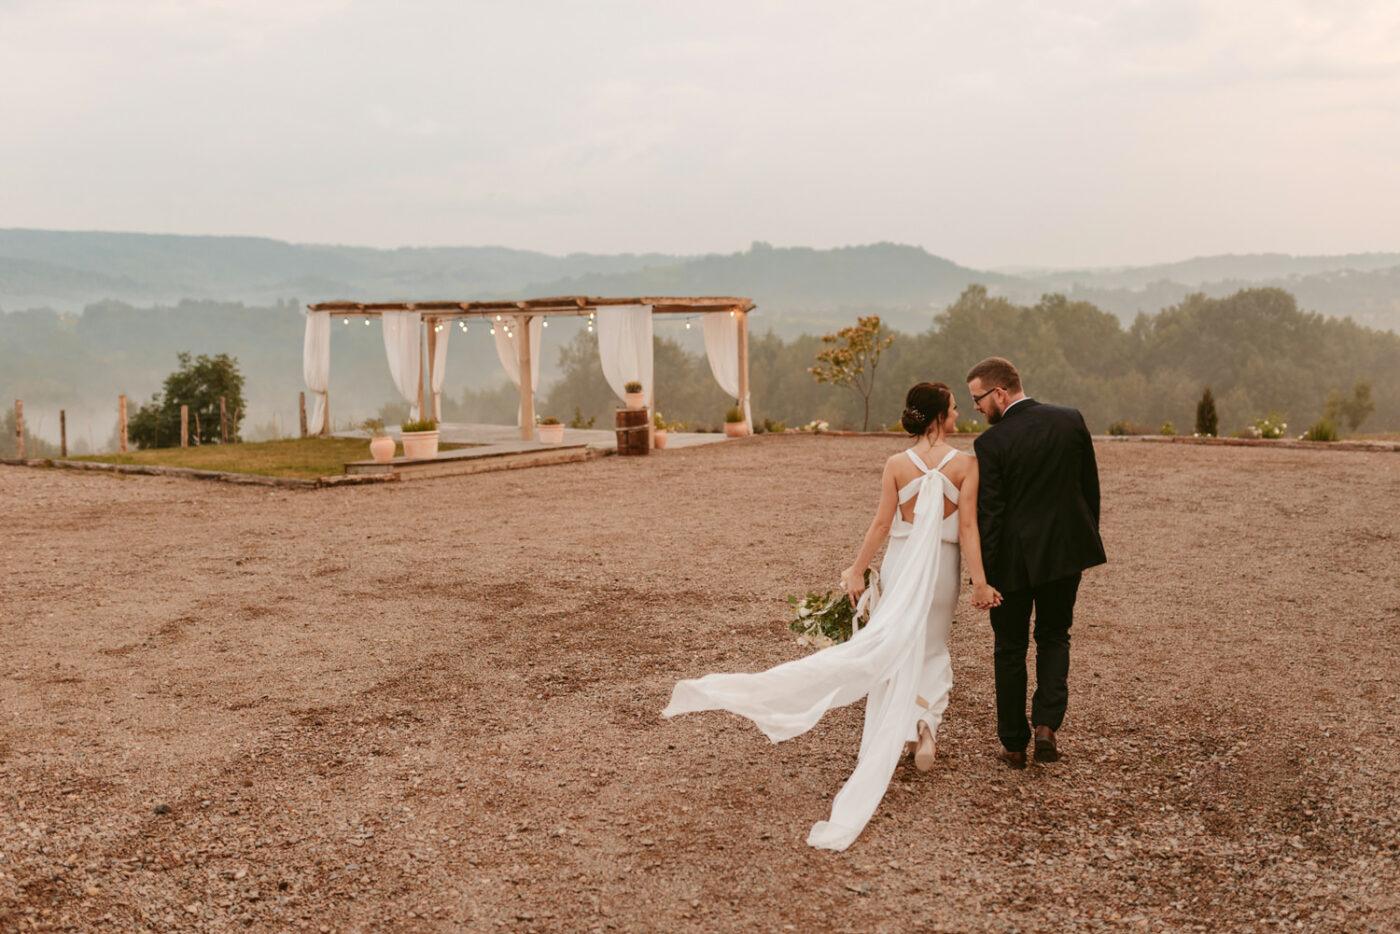 plener slubny villa love, fotograf ślubny kraków, fotografia ślubna kraków, Just Married Fotografia Ślubna